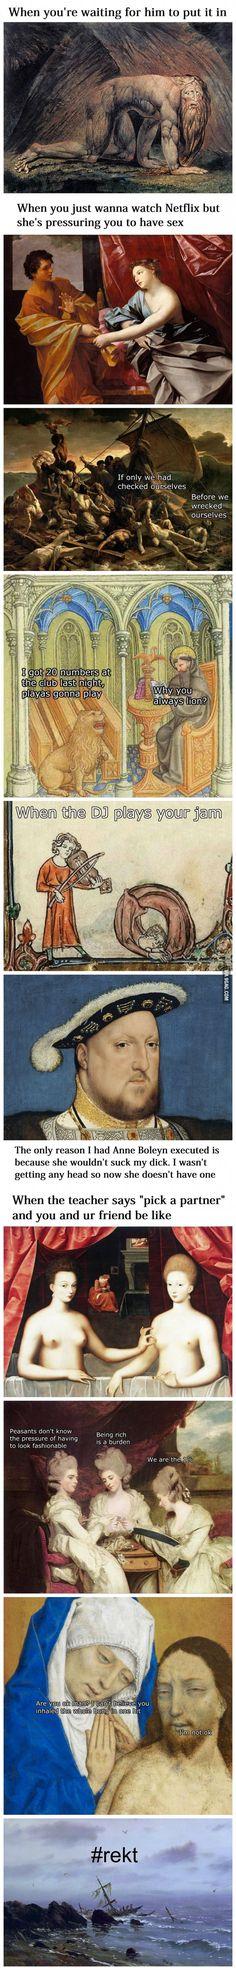 Classical Art Memes Latest (Part-2)